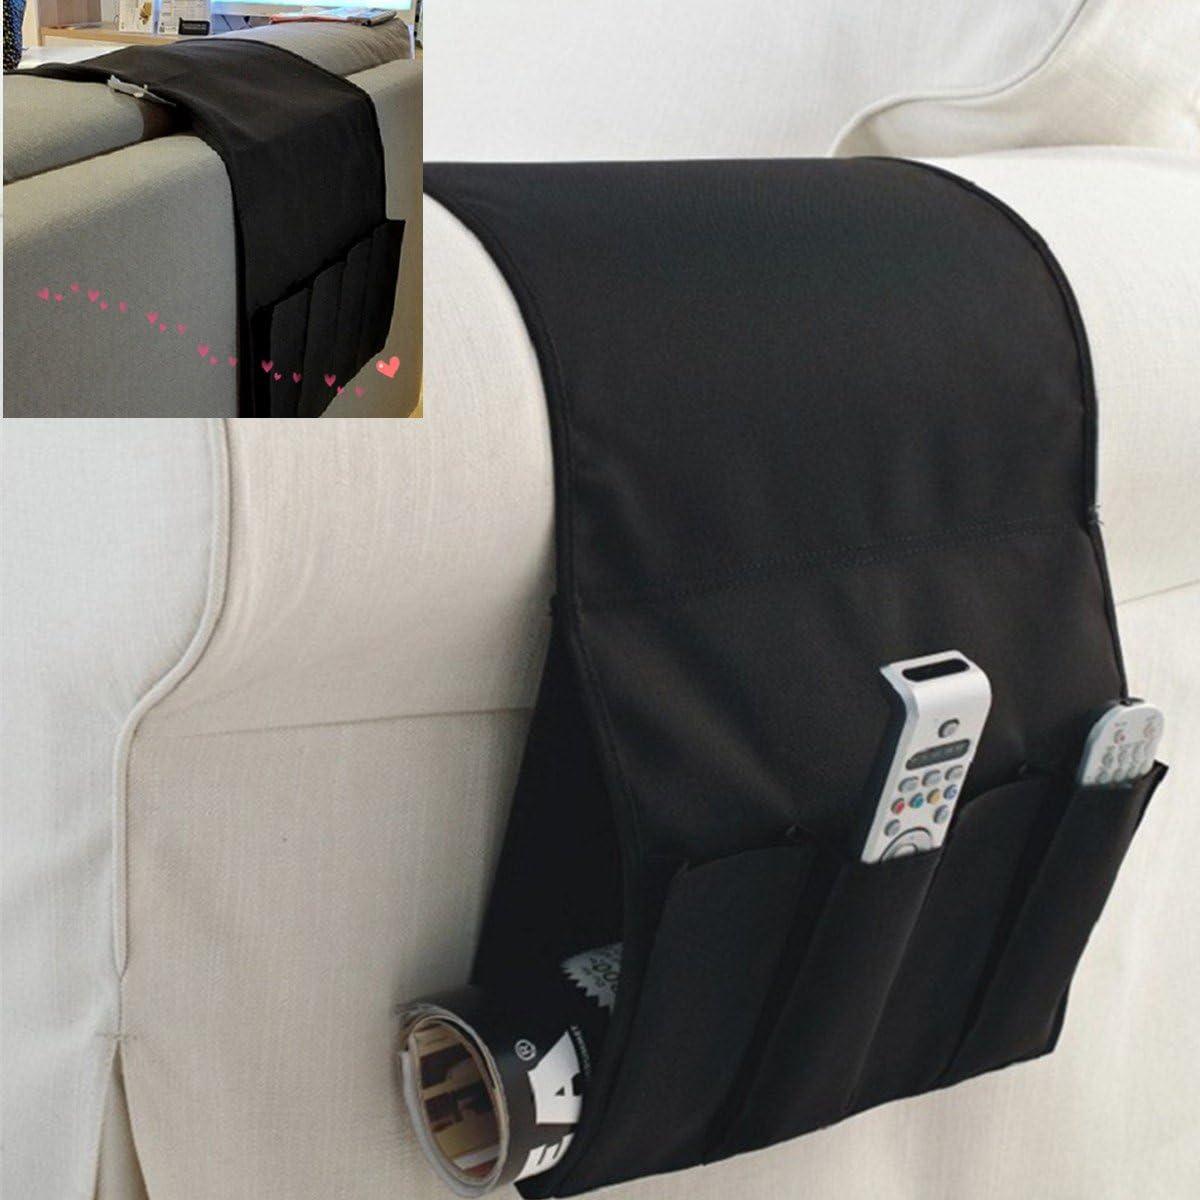 Books TV Remote Control WINOMO Zipped Pockets Hanging Storage Sofa Bed armrest Storage Bag Pouch iPhone Magzine iPad